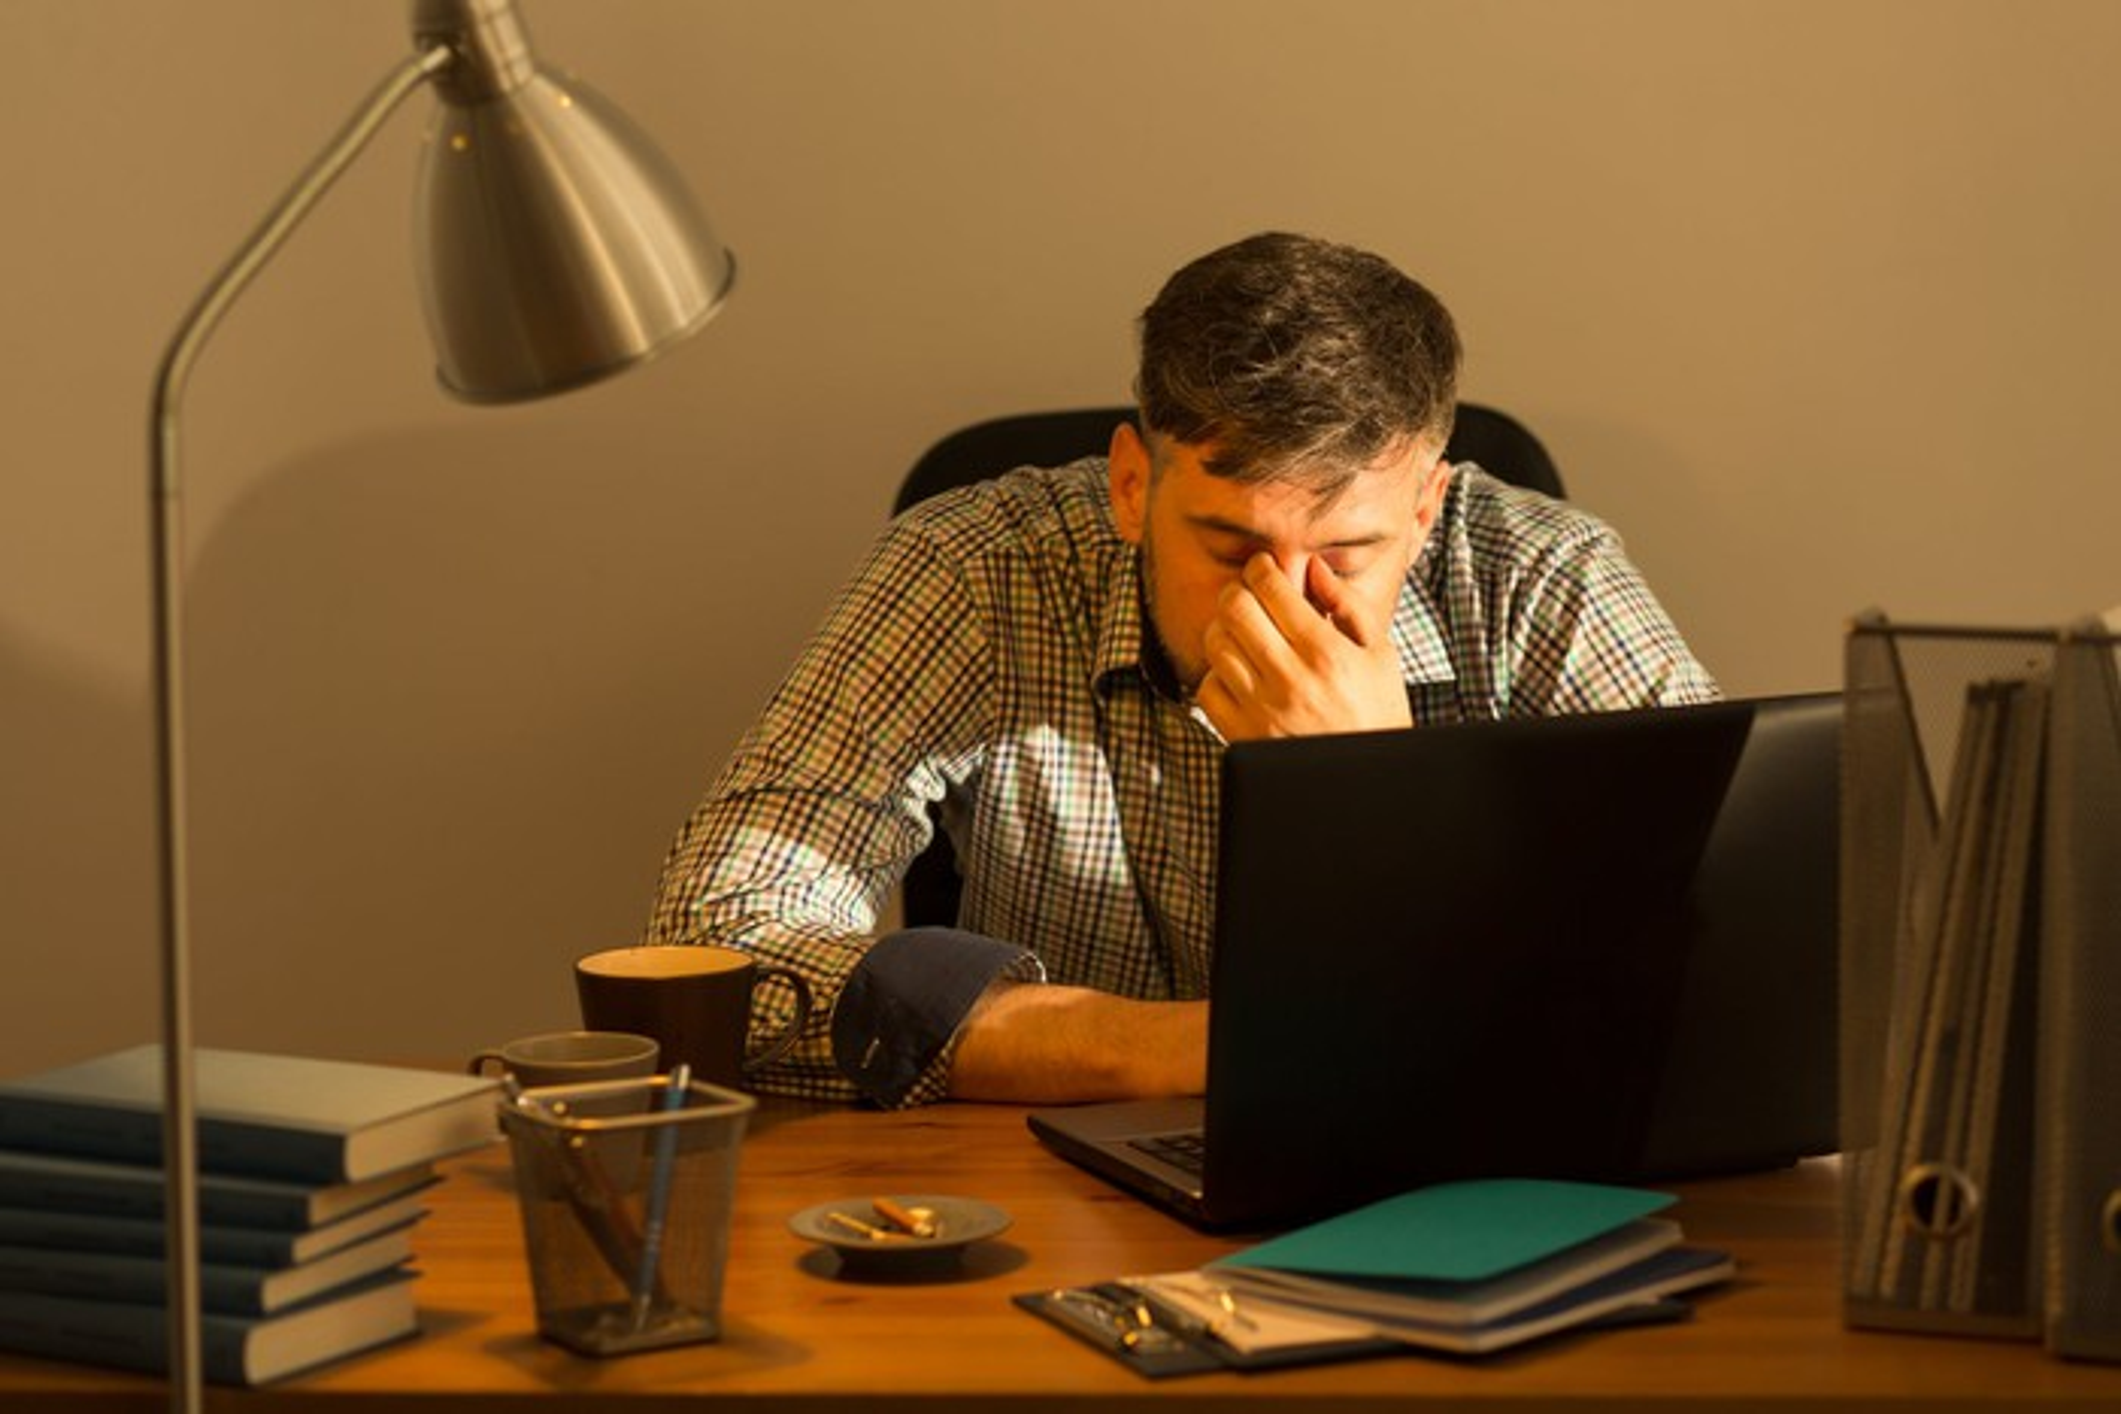 Man at a laptop rubbing his eyes